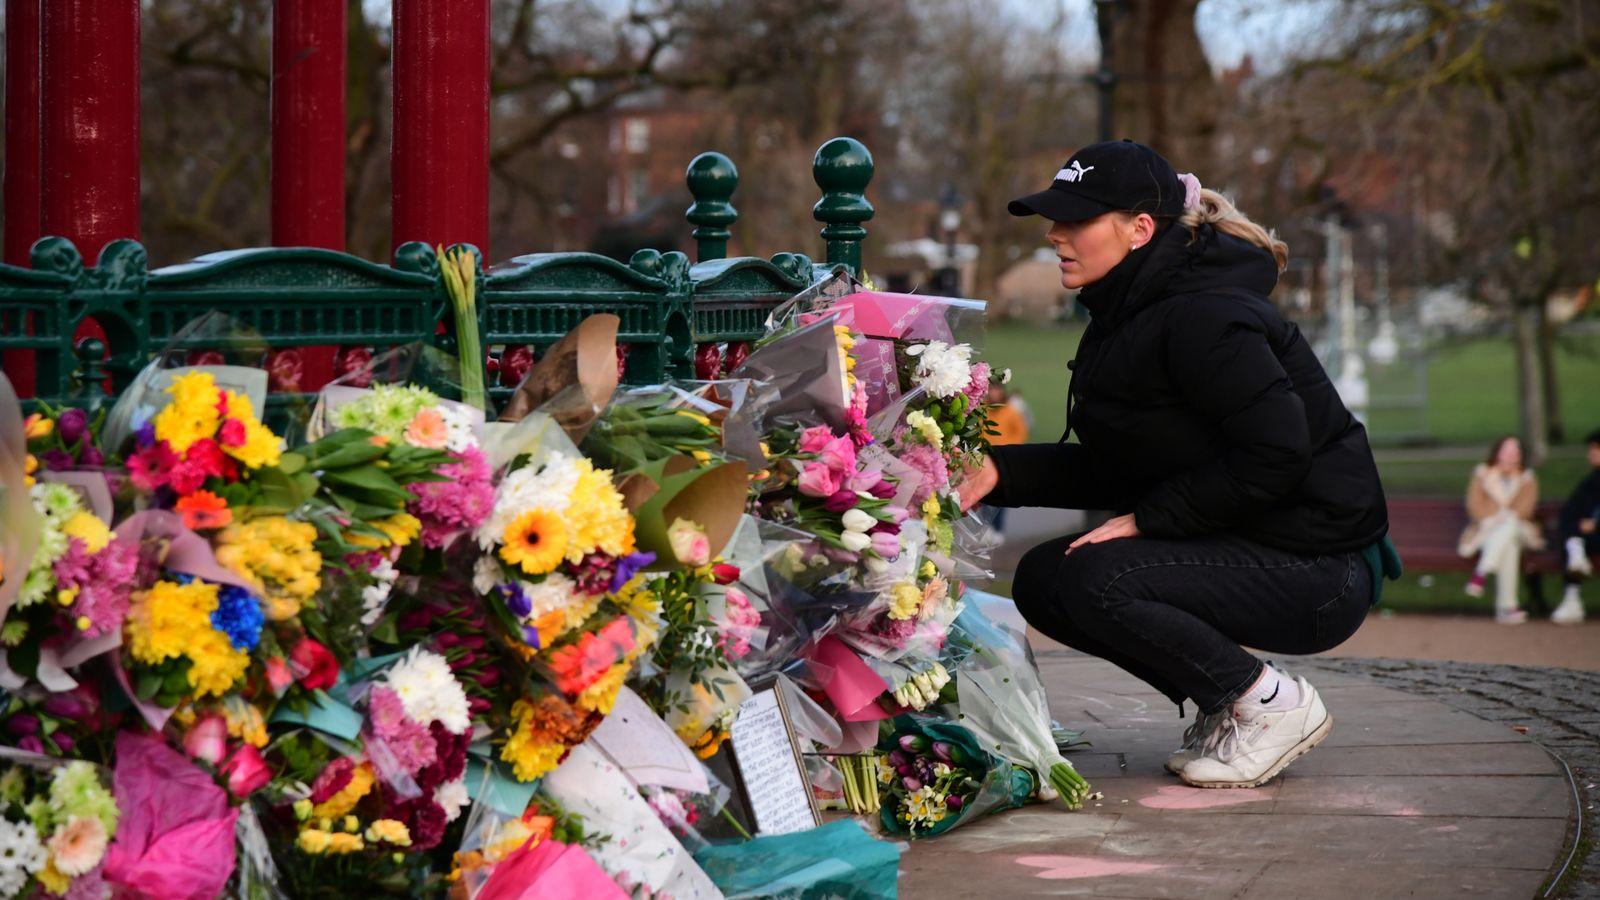 Sarah Everard vigil: Clapham event canceled after talks with police, organizers say |  UK News